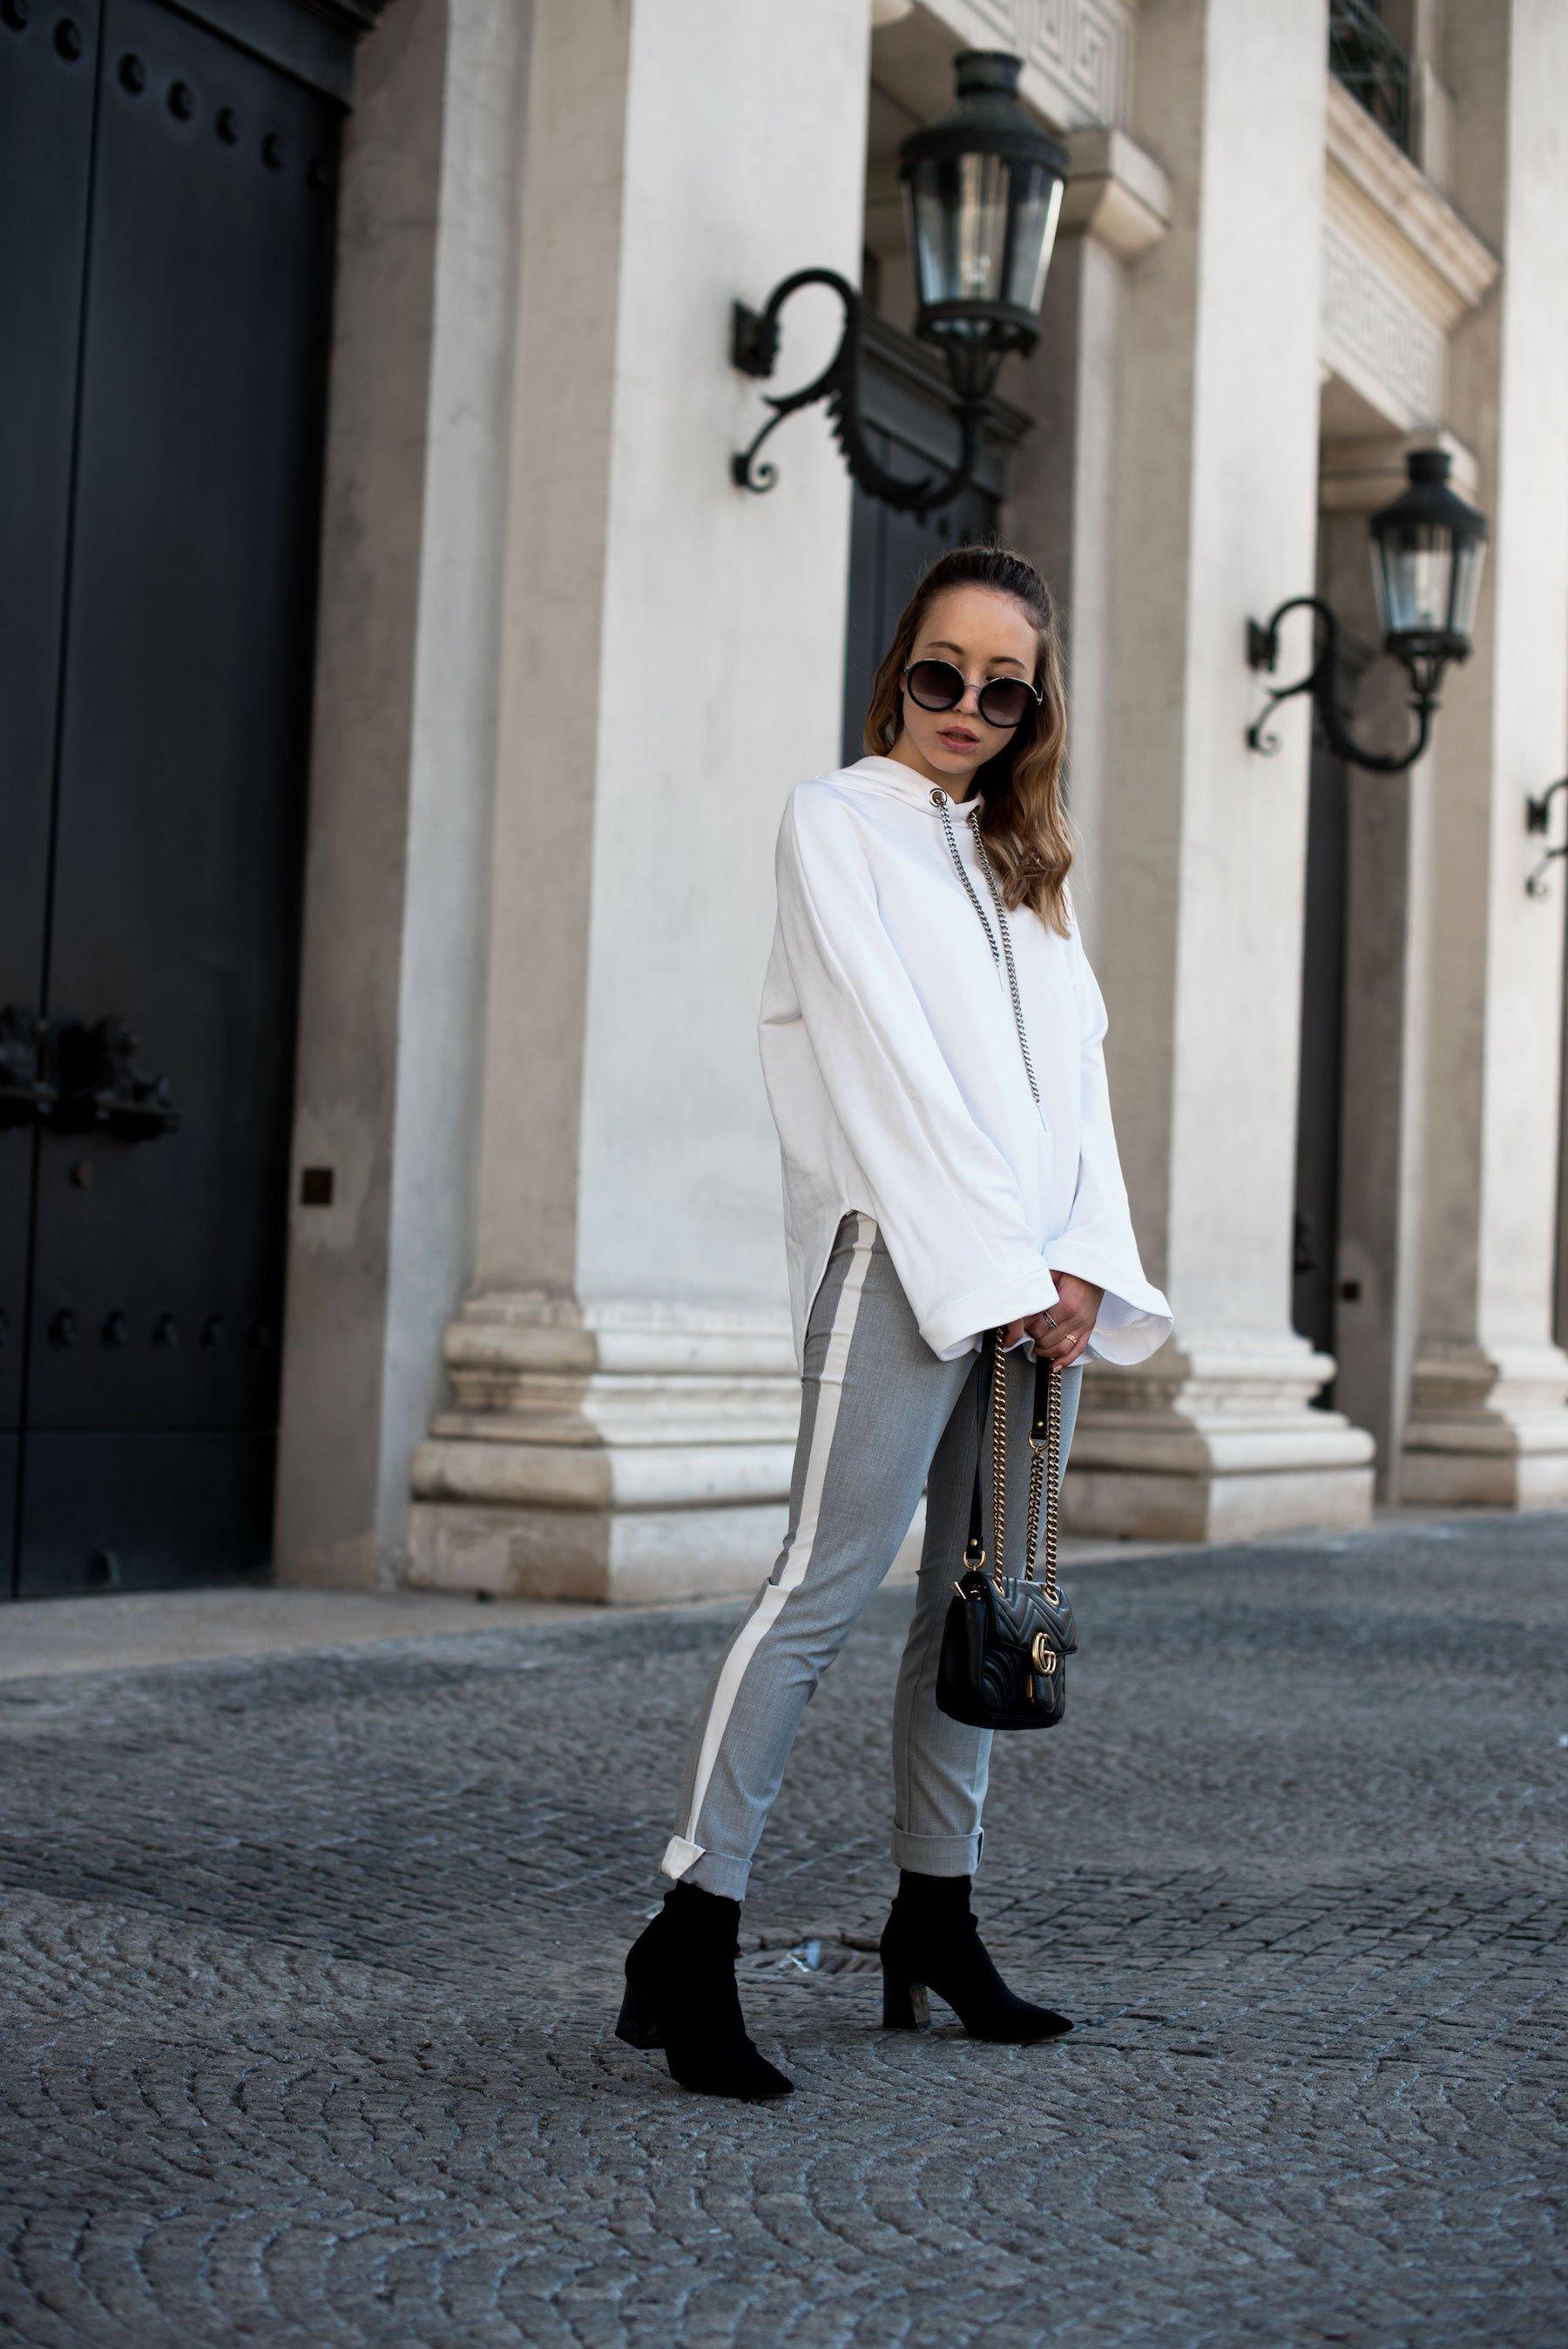 Sweatshirt Trend, weißes Sweatshirt, graue Stoffhose, Stylemocca